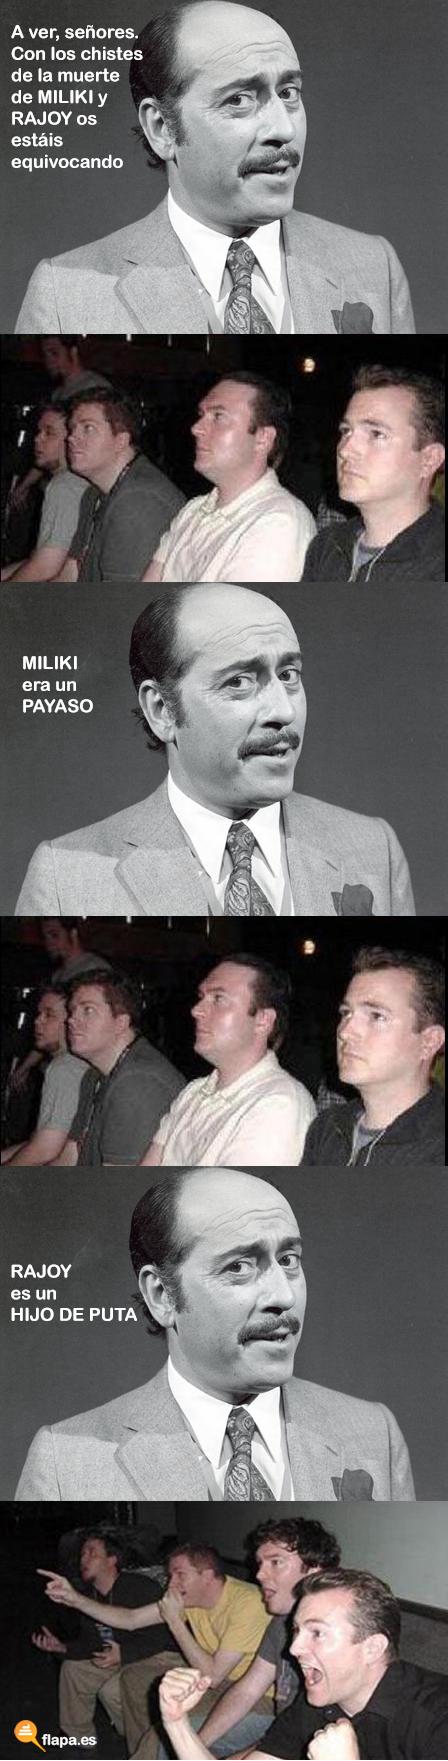 humor, viñeta, miliki, rajoy, funny, flapa